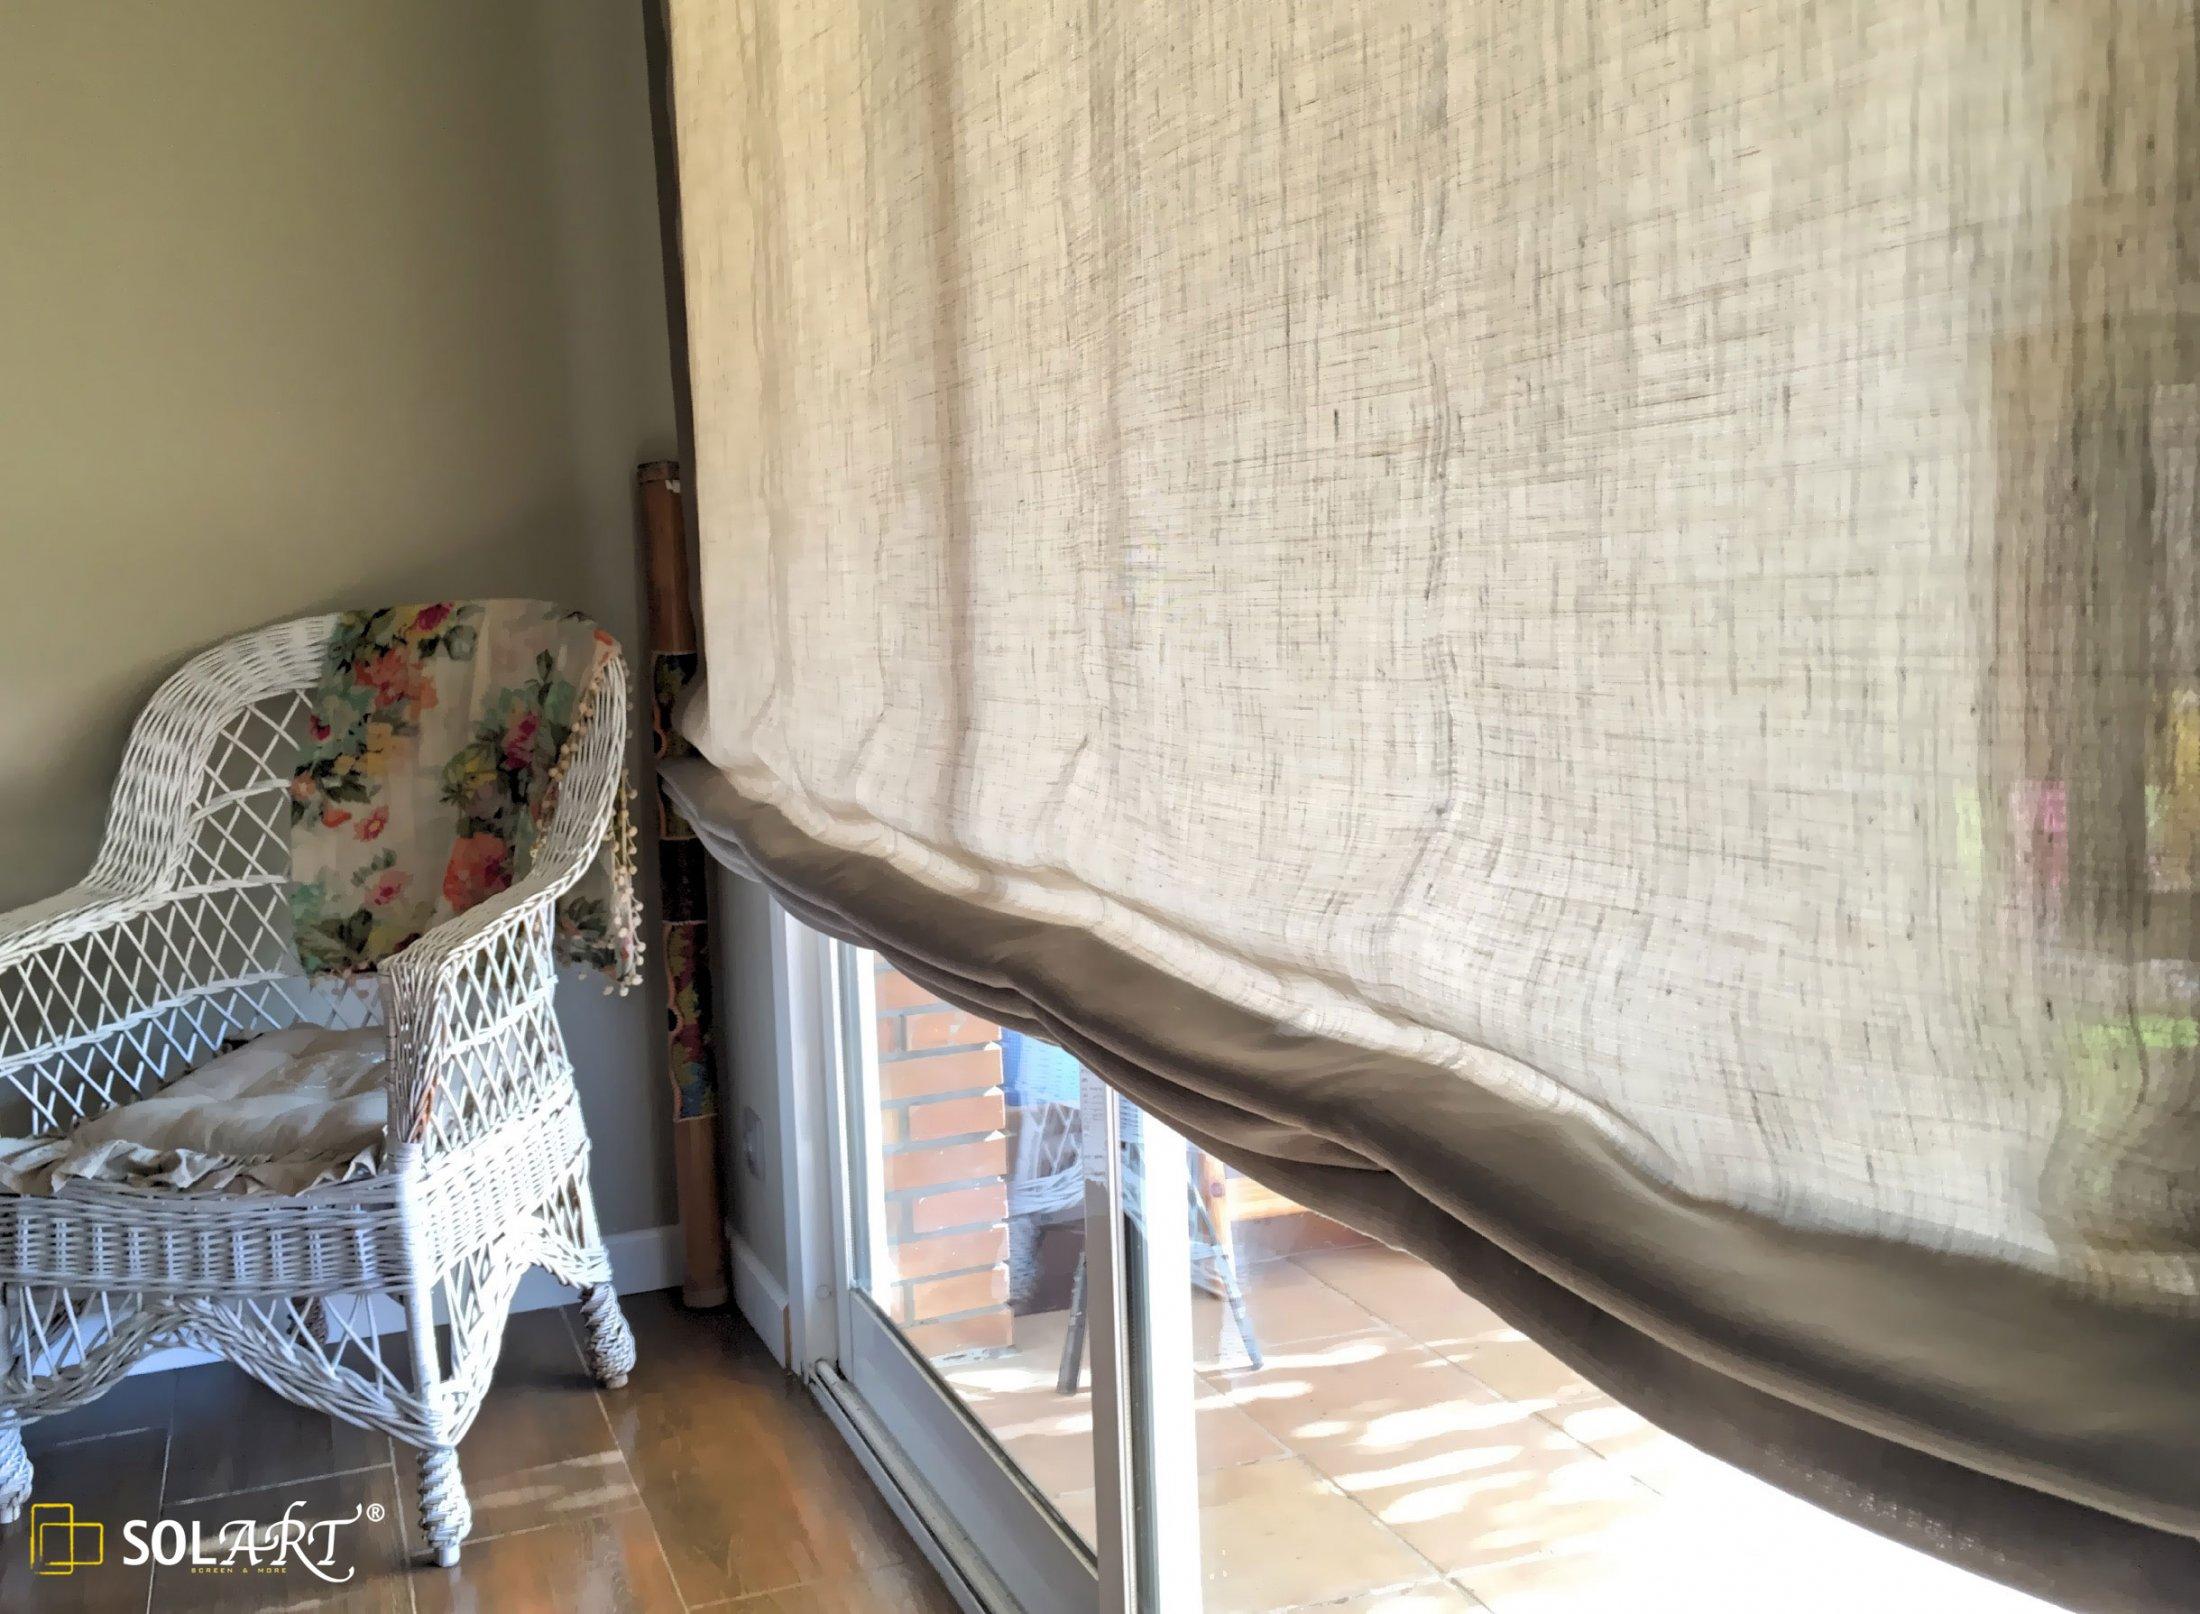 Cortinas pachetto solart 23 solart - Comprar cortinas barcelona ...